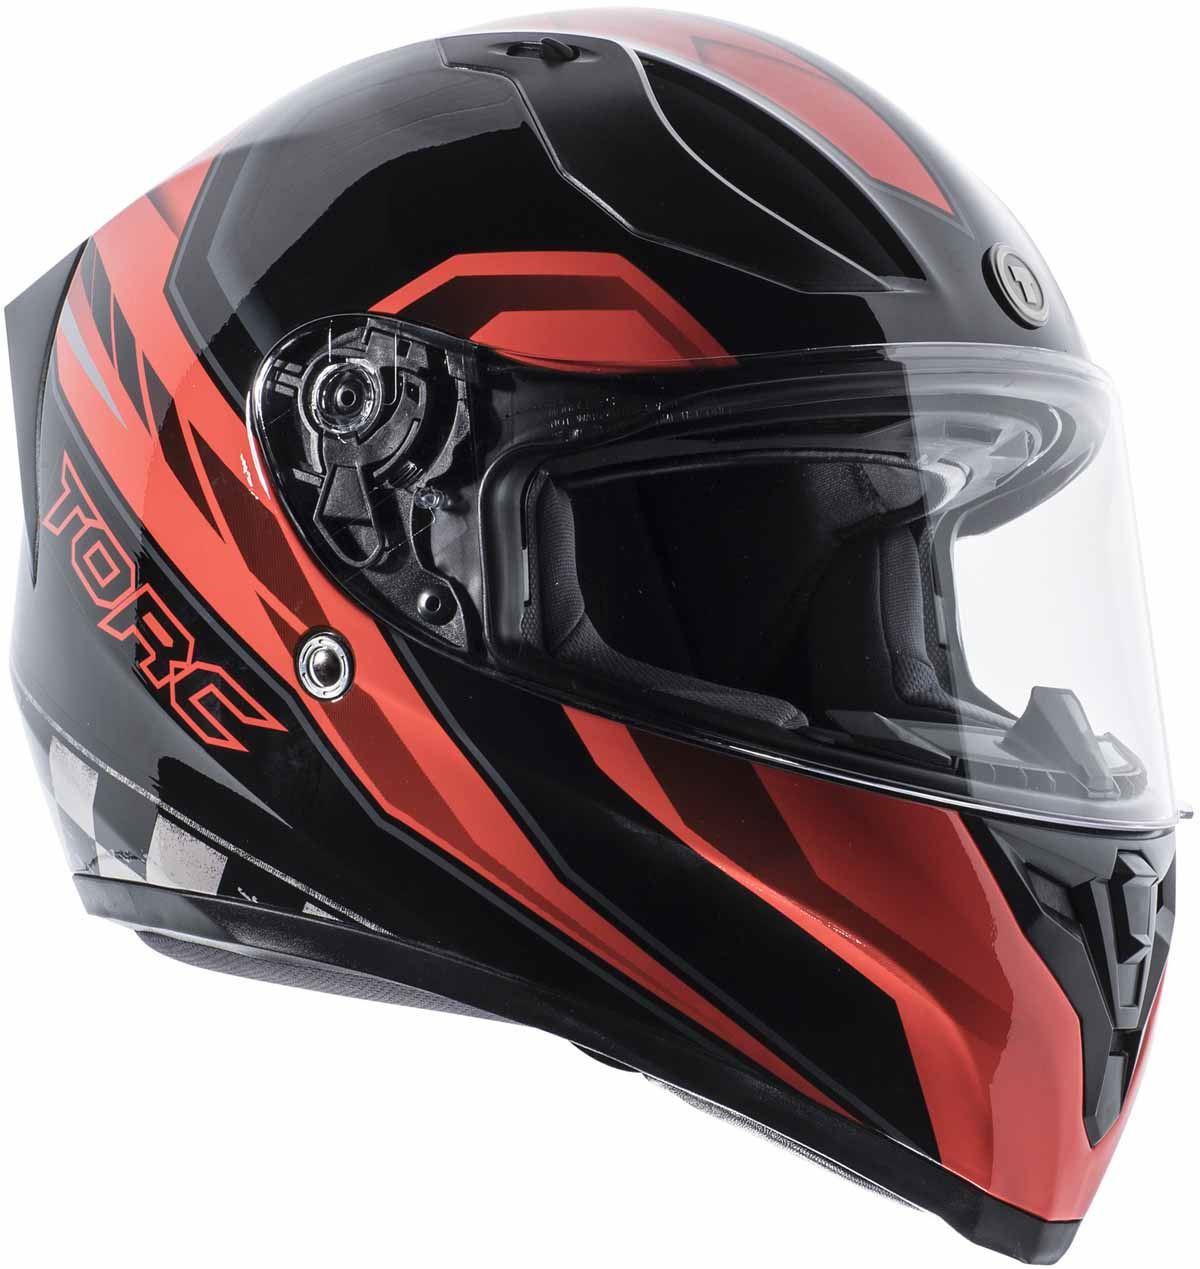 miniature 24 - Torc T15 T15B Helmet Bluetooth Blinc or without - Inner Sun Shield DOT XS-2XL